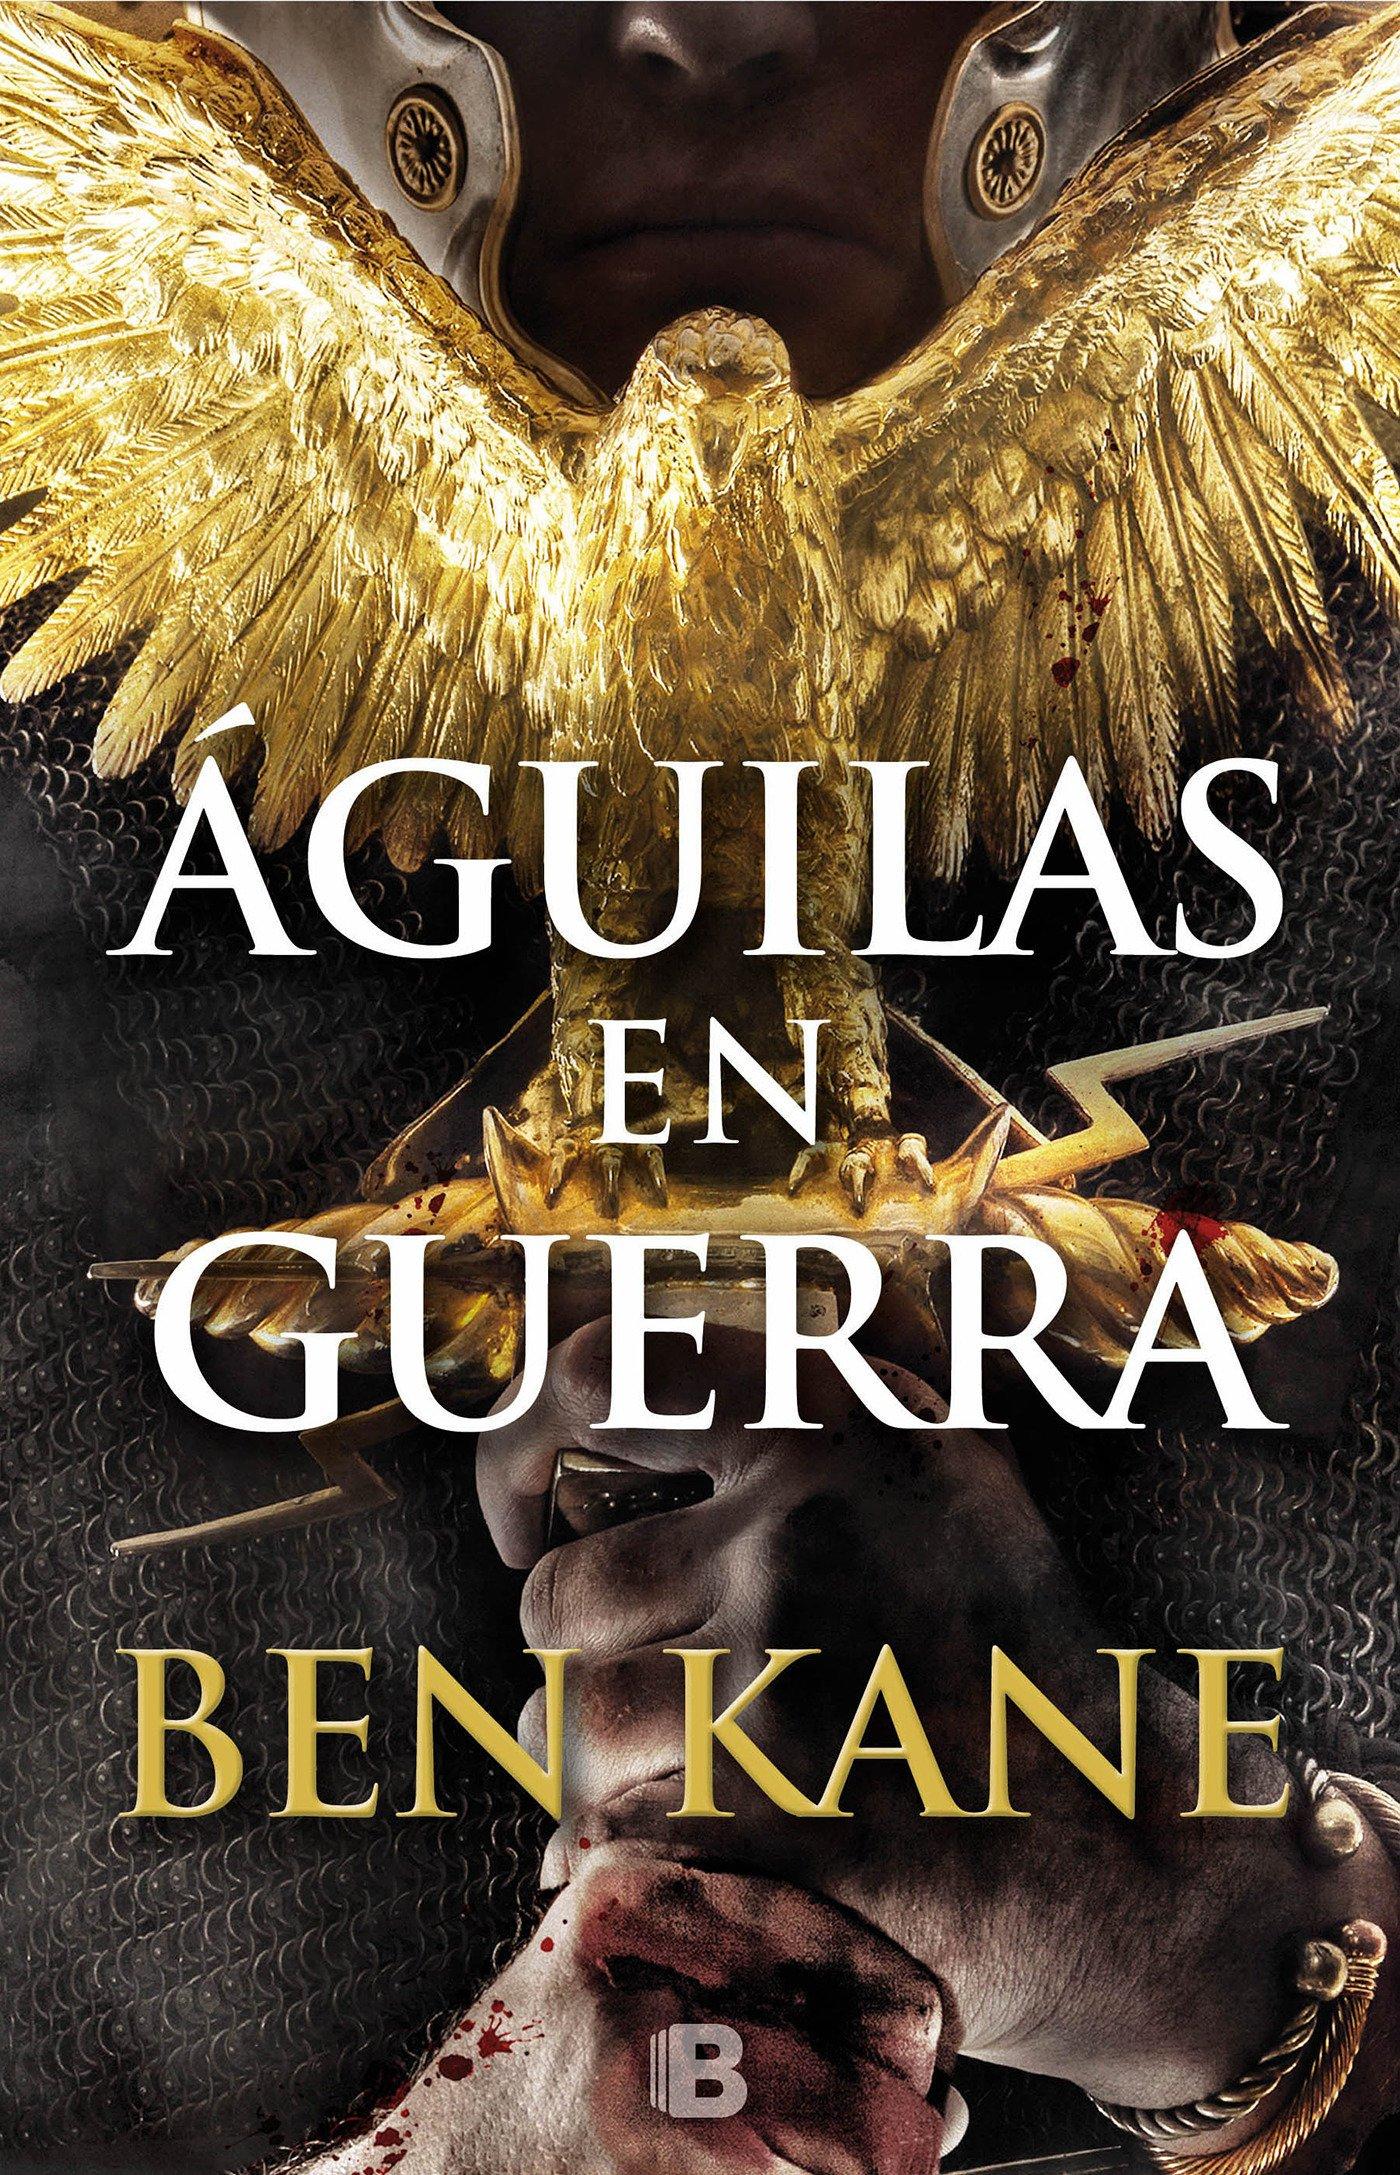 Águilas en guerra (Águilas de Roma 1) (HISTÓRICA) Tapa dura – 20 ene 2016 Ben Kane B (Ediciones B) 8466658343 Literary